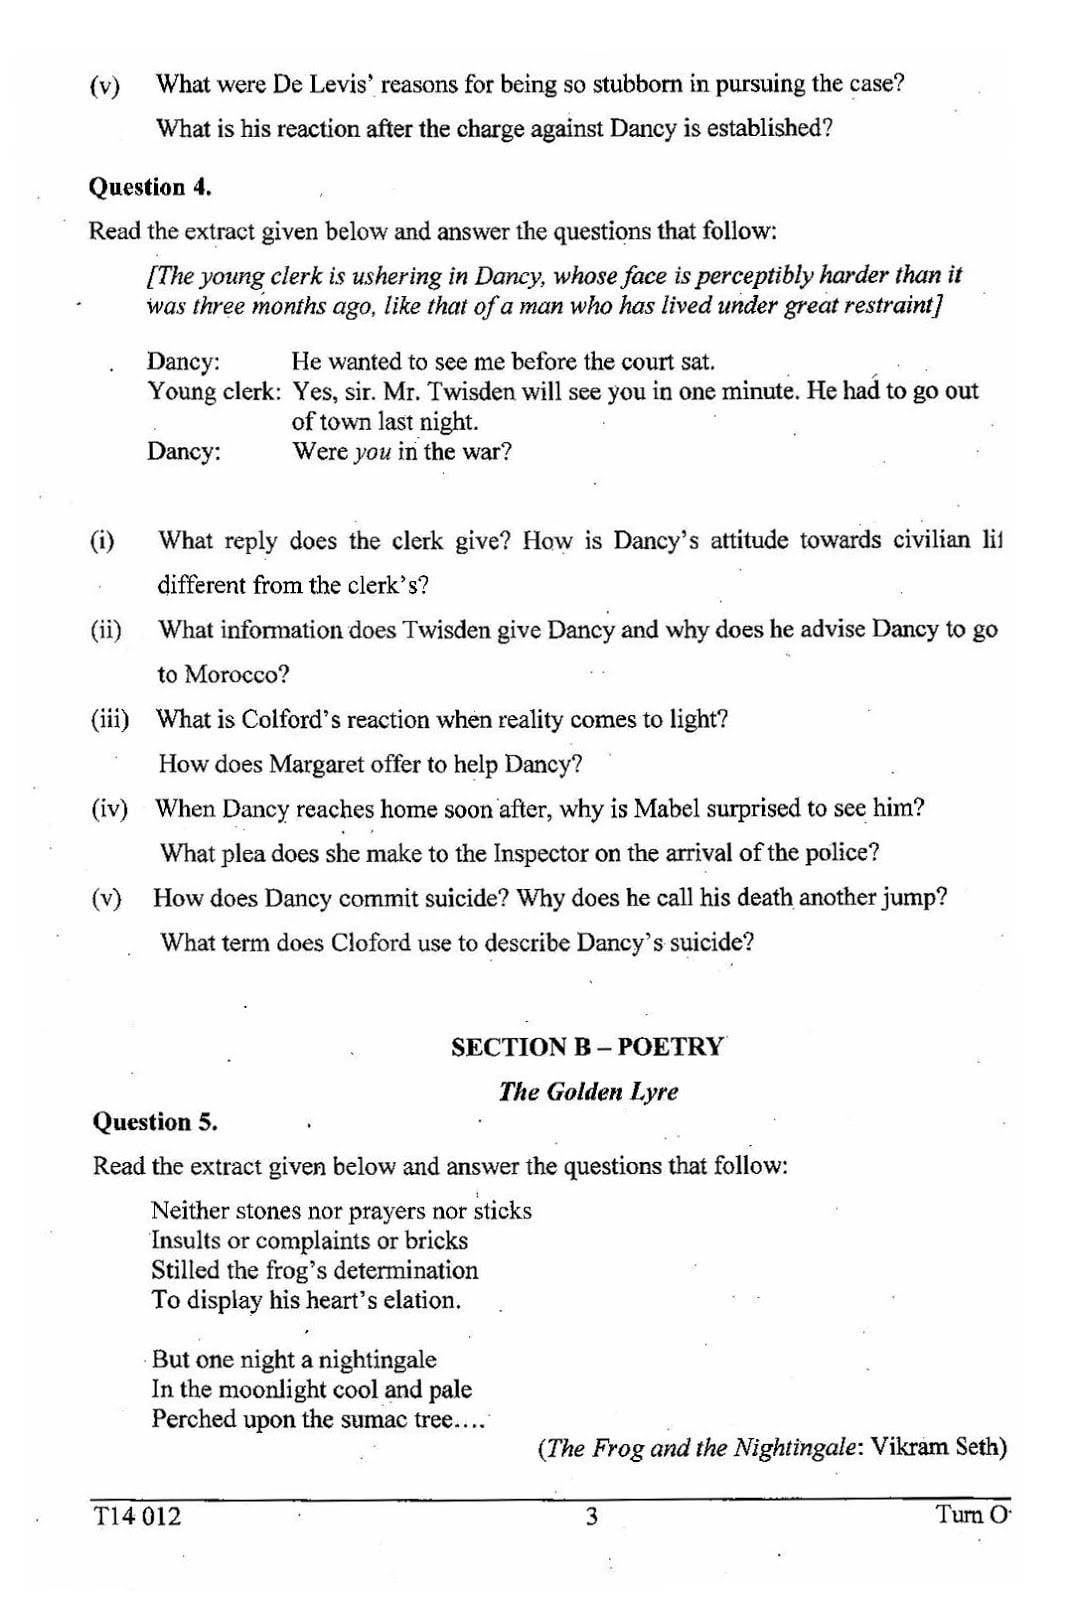 ICSE Class 10 English Literature 2014 Question Paper